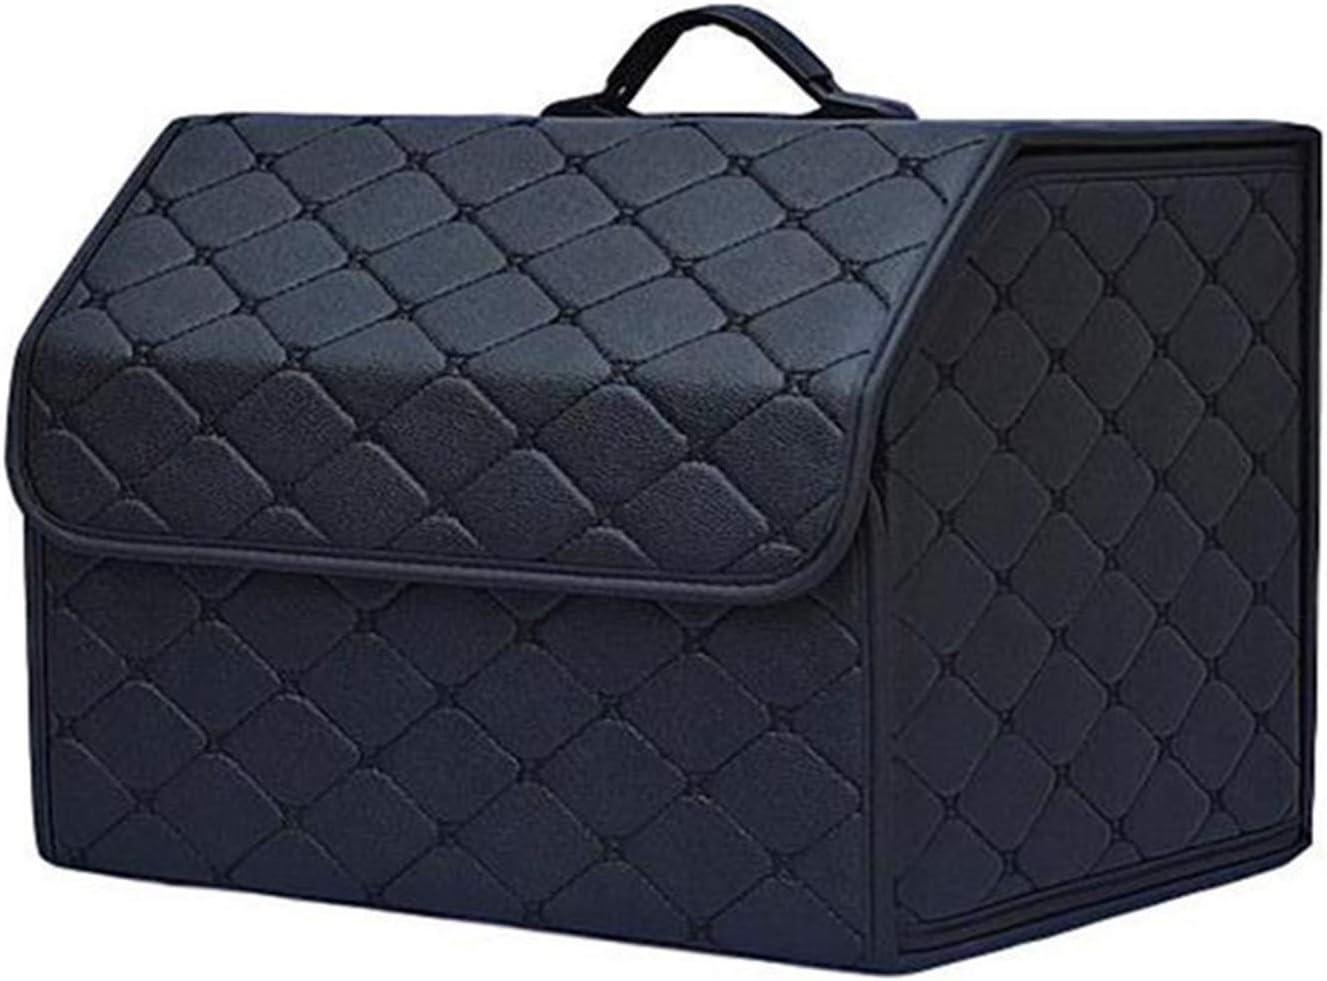 Dheera Car Storage Bag PU Leather Finally popular brand B Organizer Box Folding Trunk discount